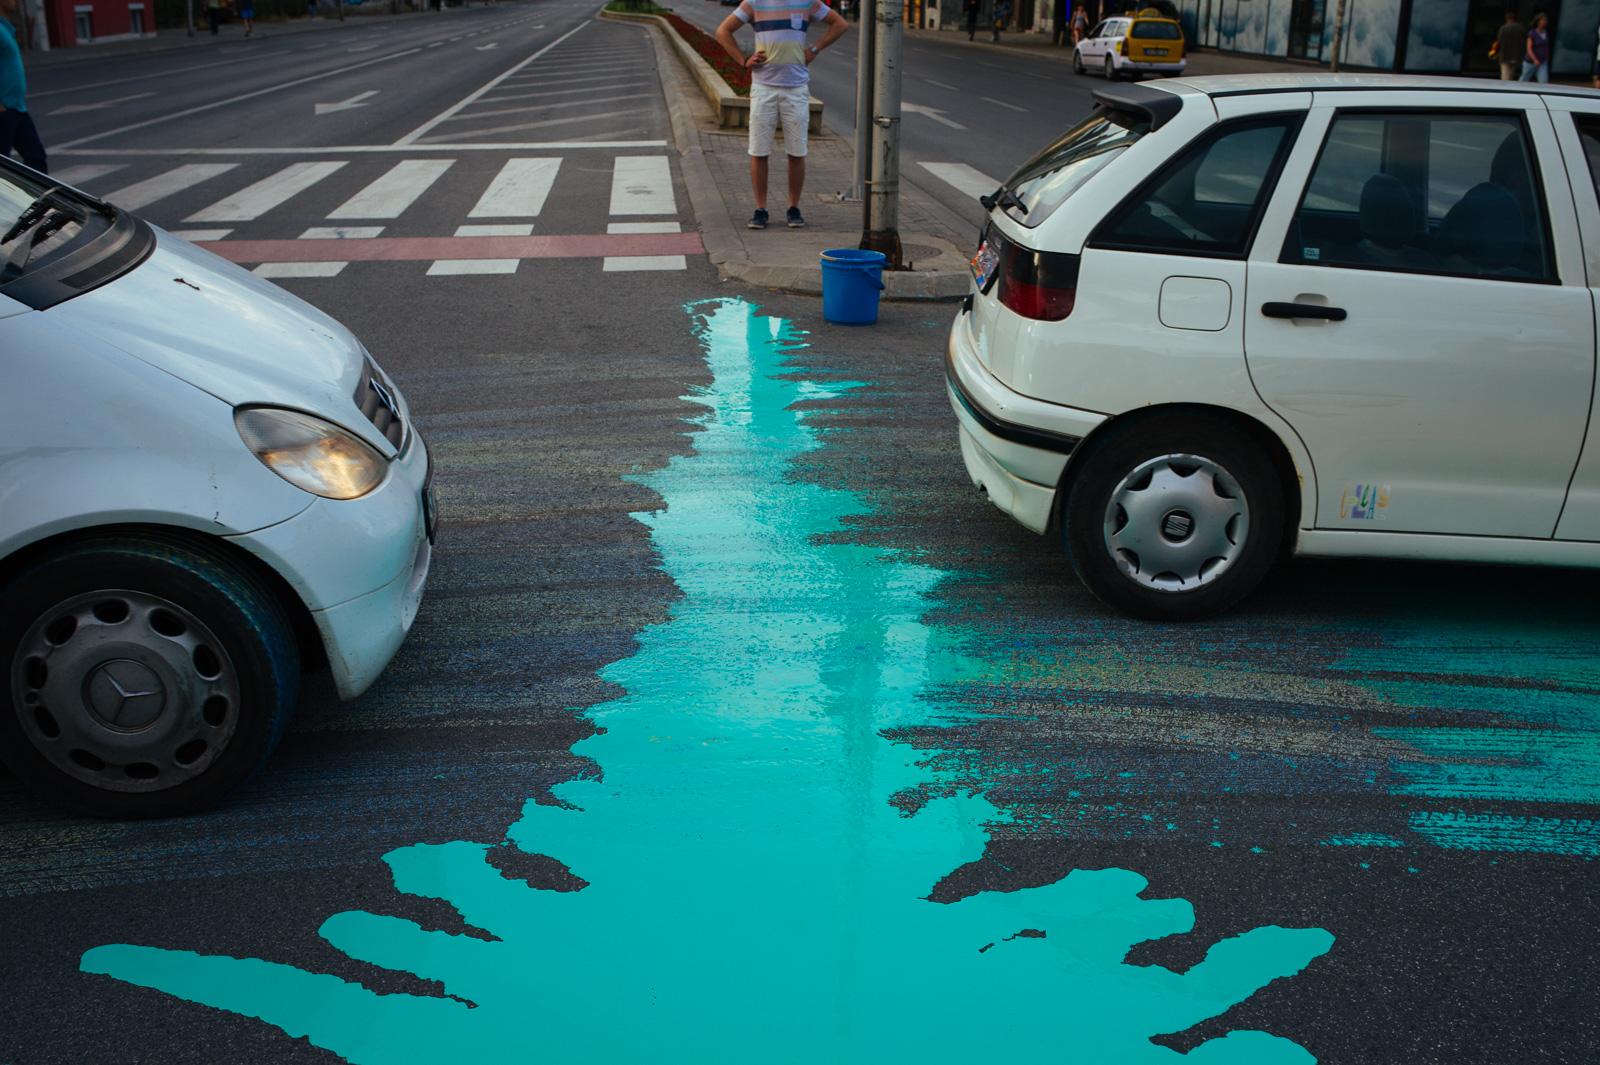 06_PHM_MKD_ColorfulRevolution_7587.jpg